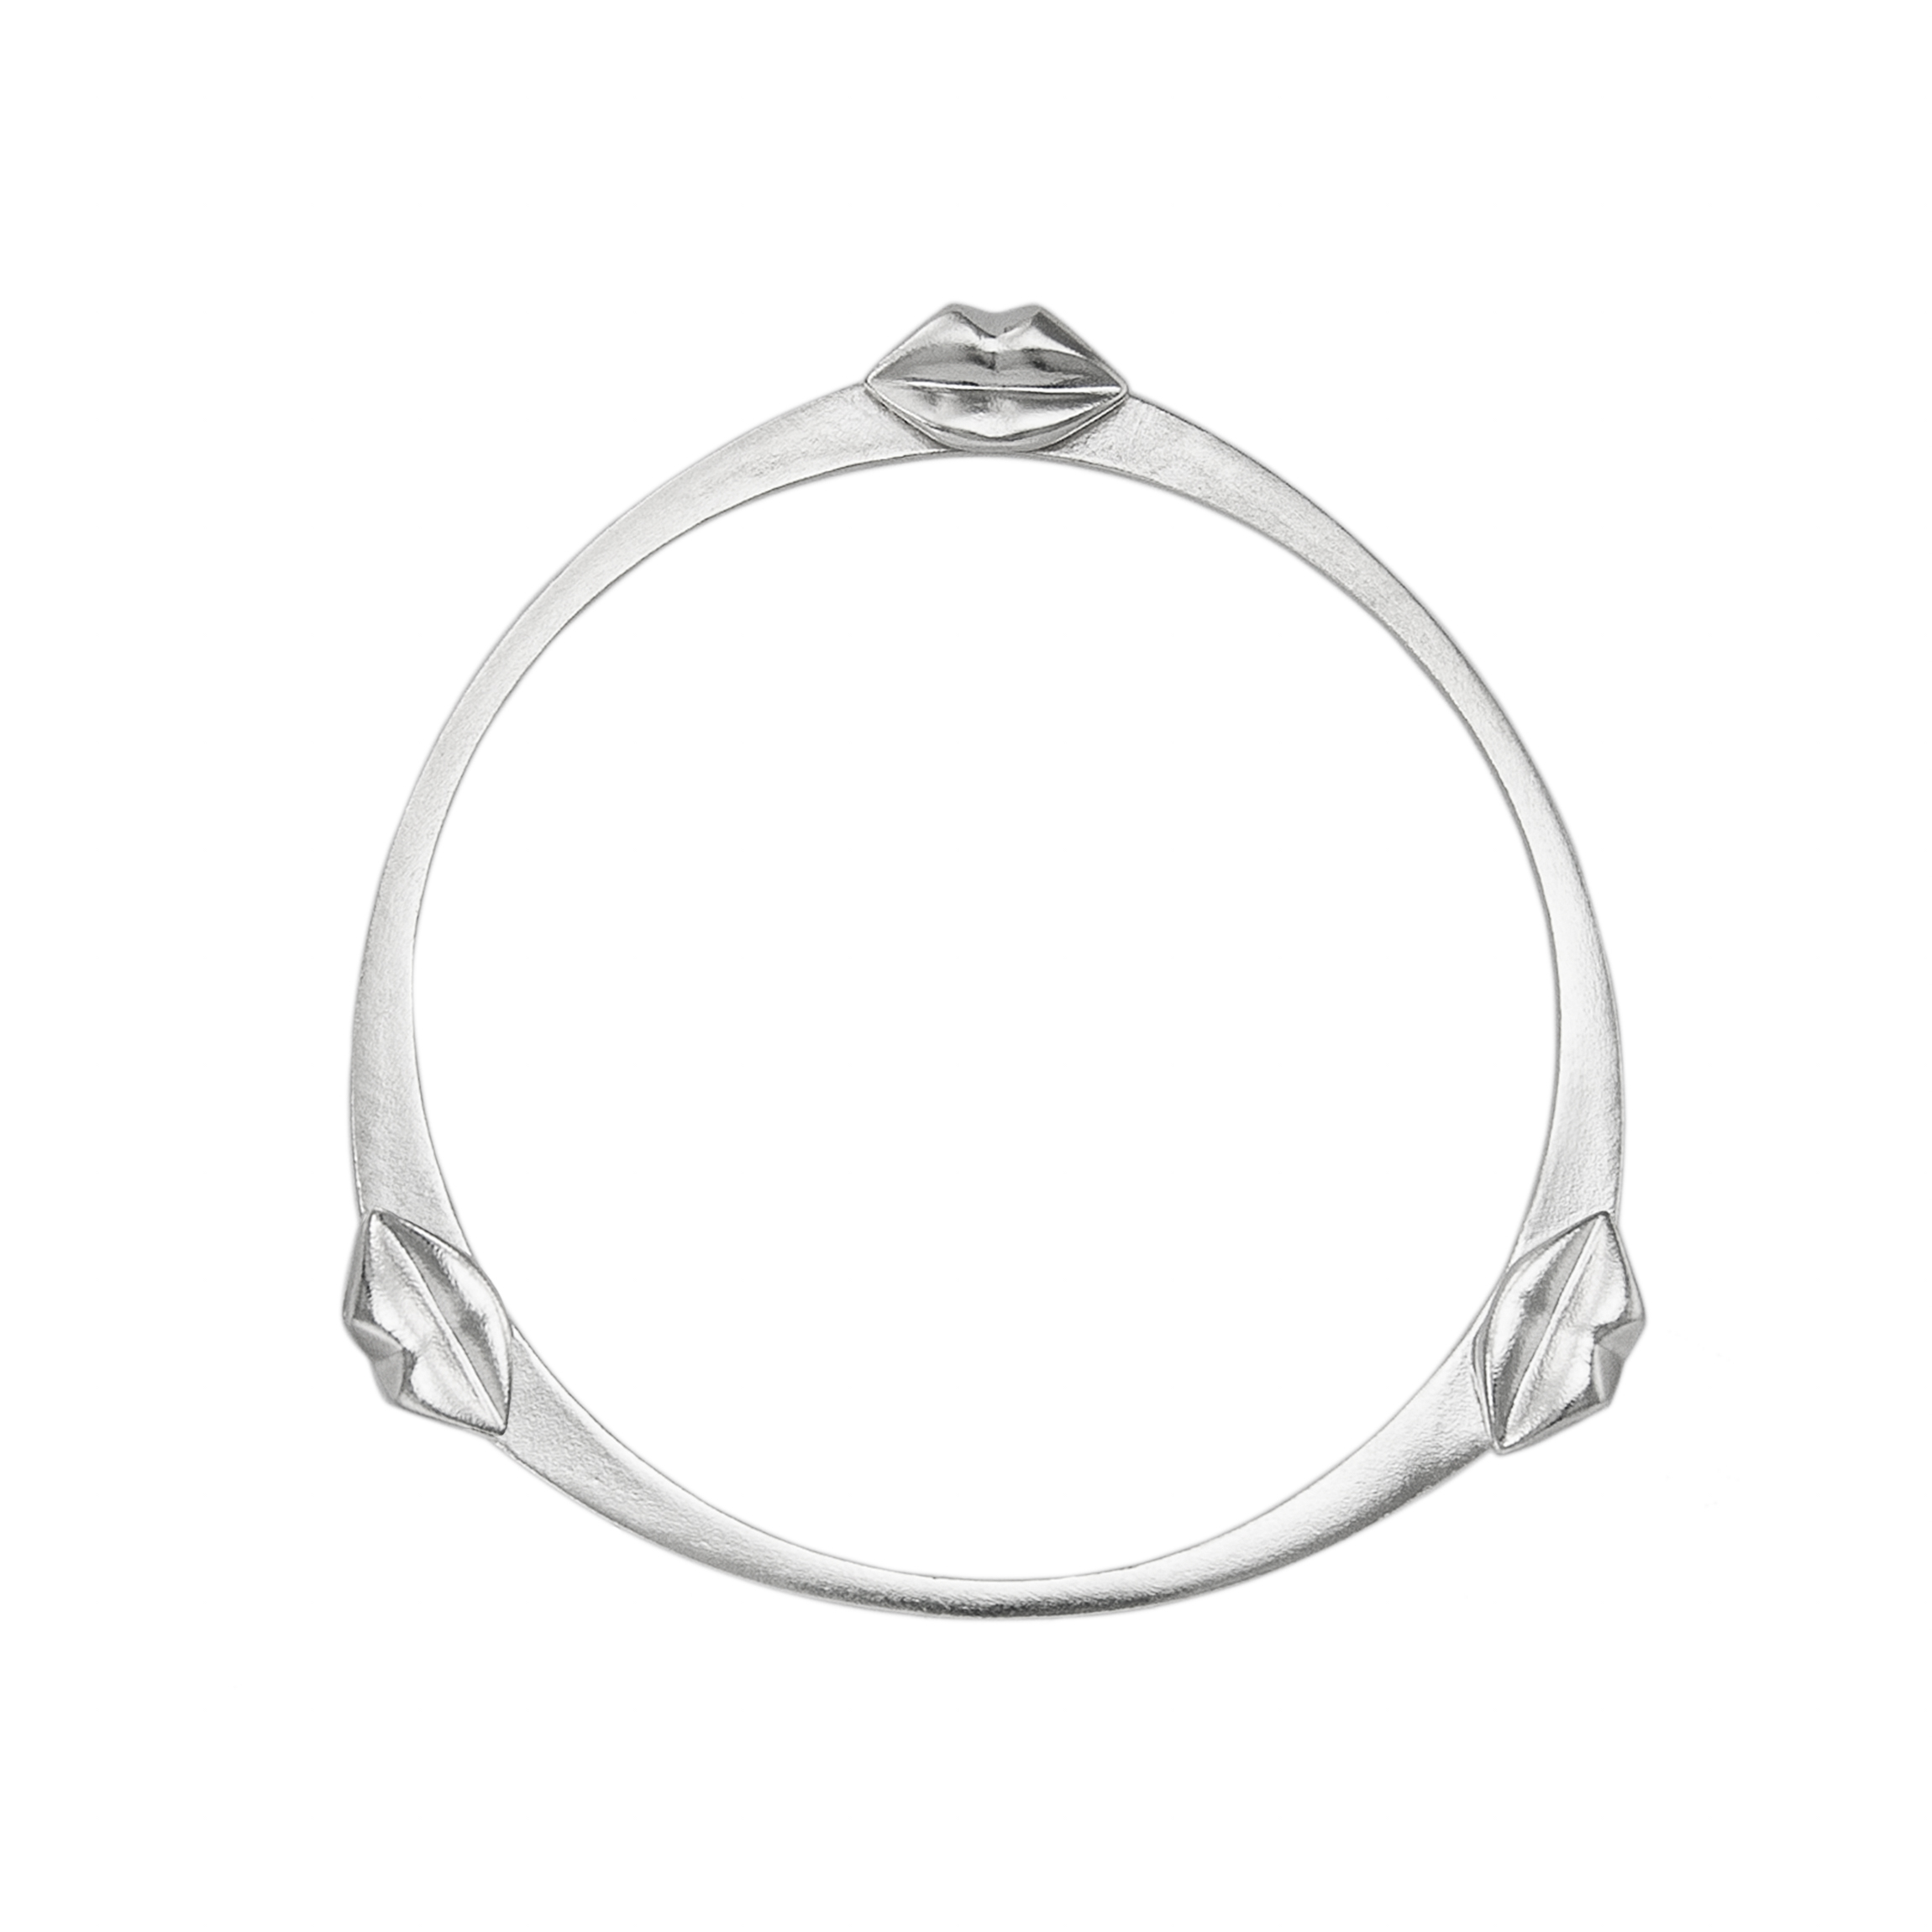 kozminka-bracelet-bangle-3-kiss-silver.jpg